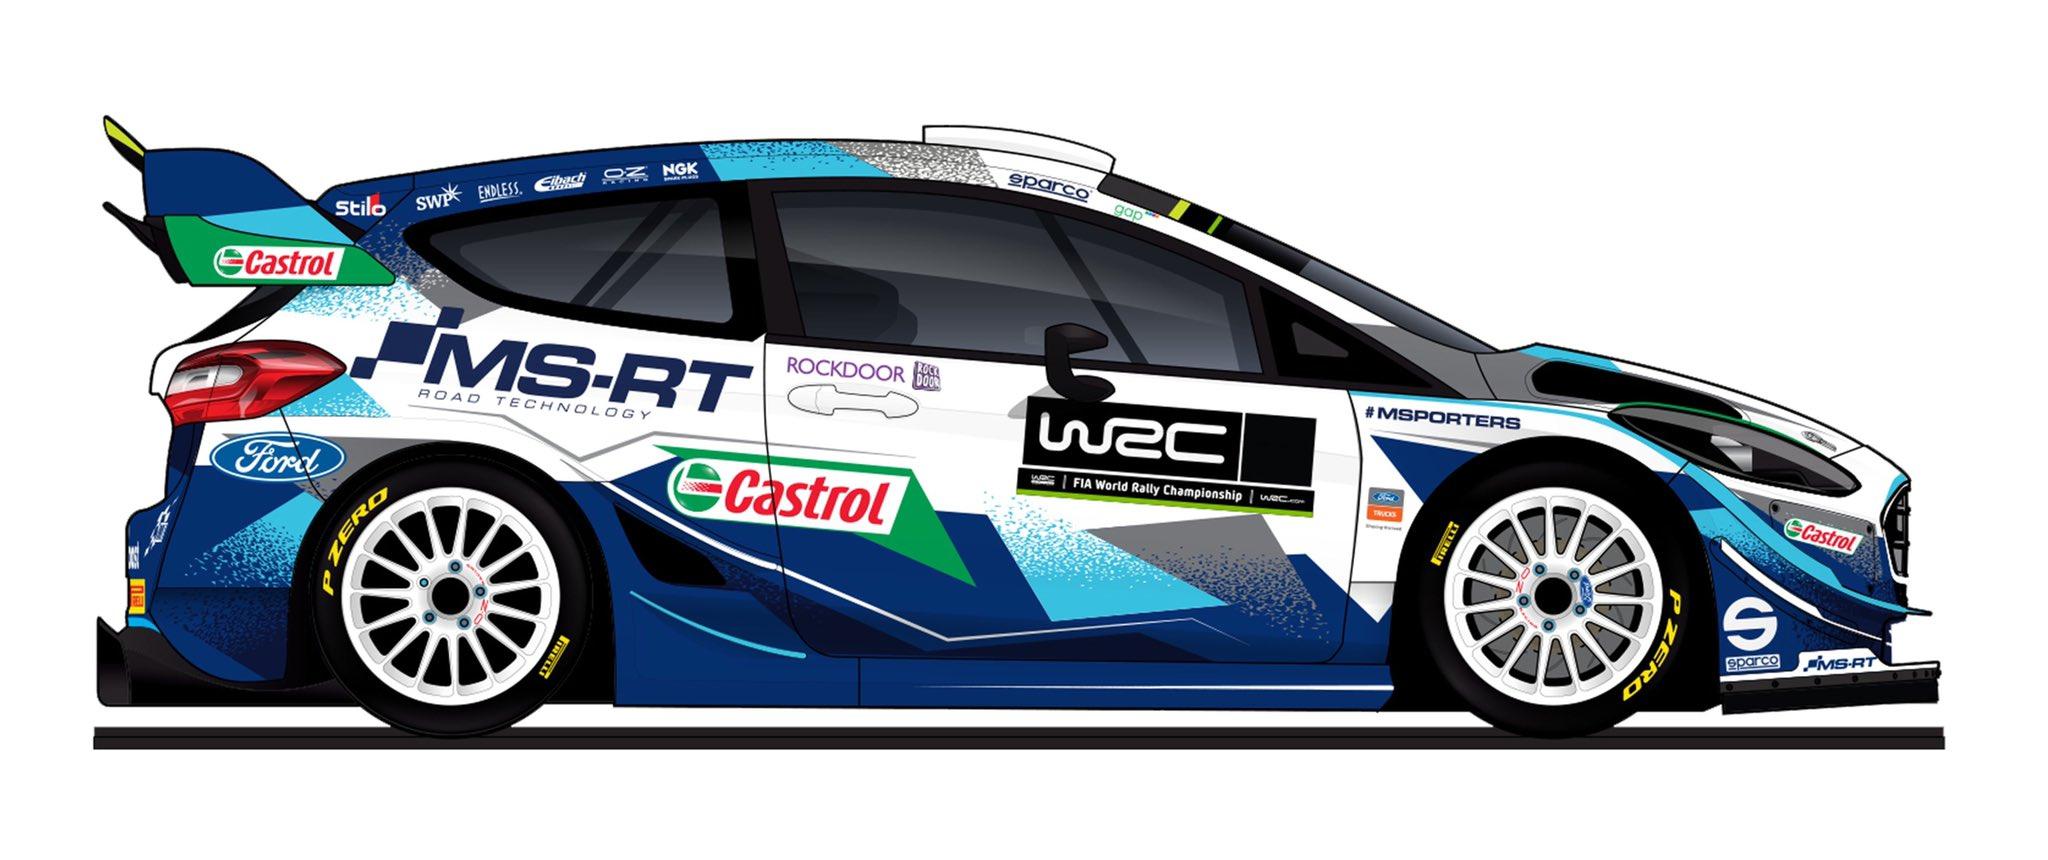 World Rally Championship: Temporada 2021  - Página 2 ErC_E6fXUAEWZhZ?format=jpg&name=large